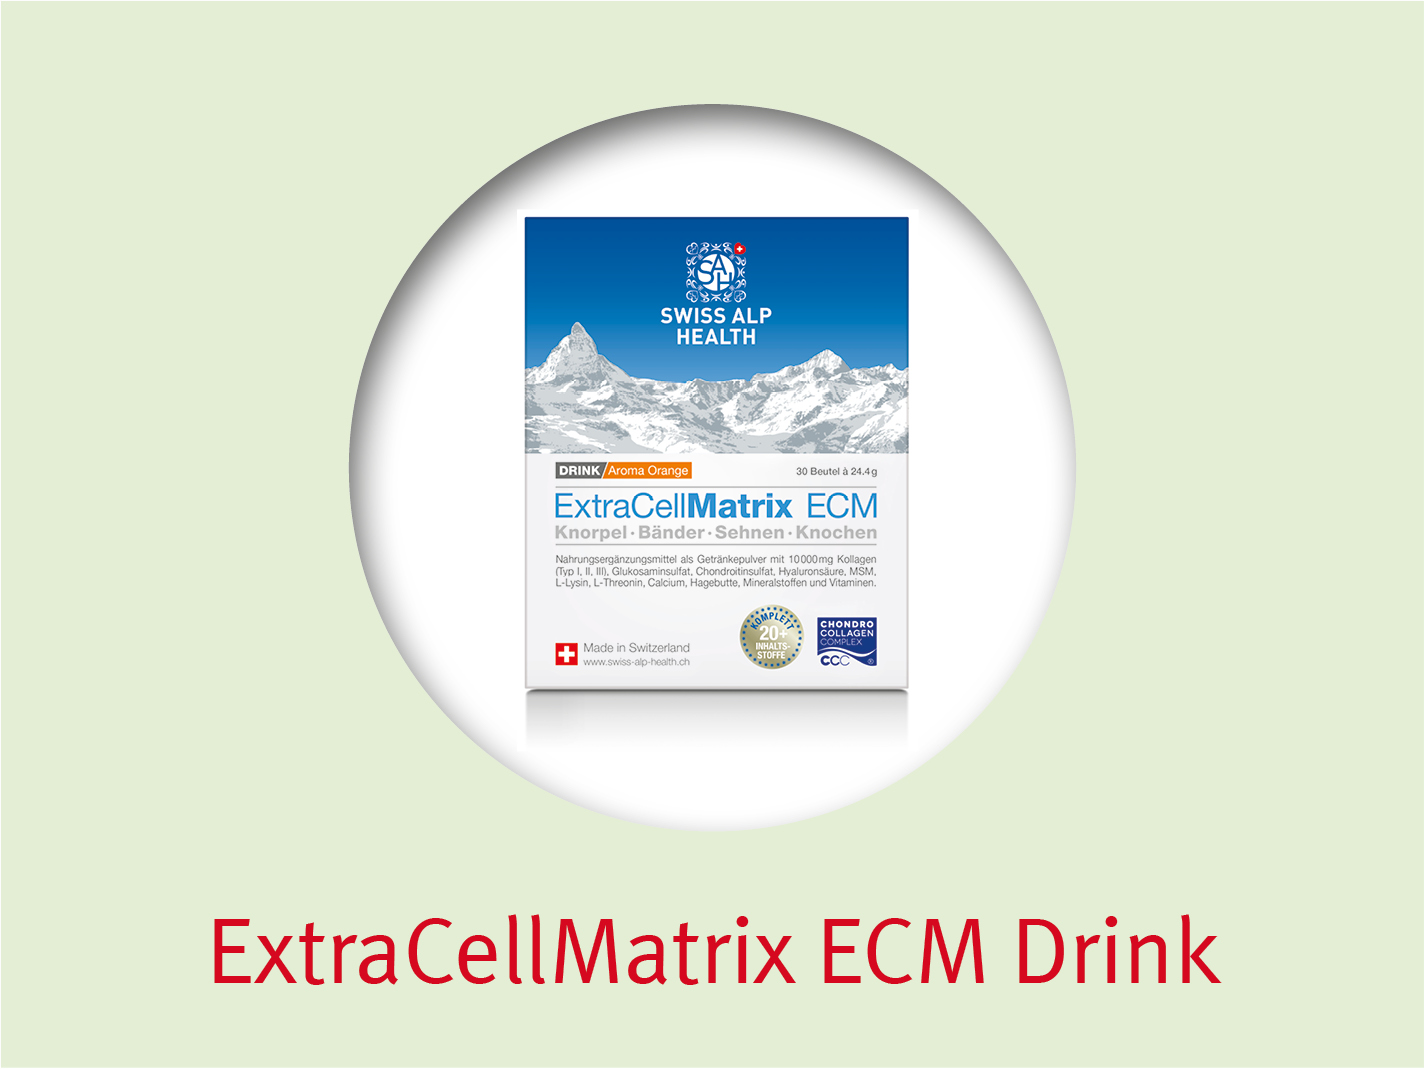 teaserbox_extracellmatrix_drink.jpg